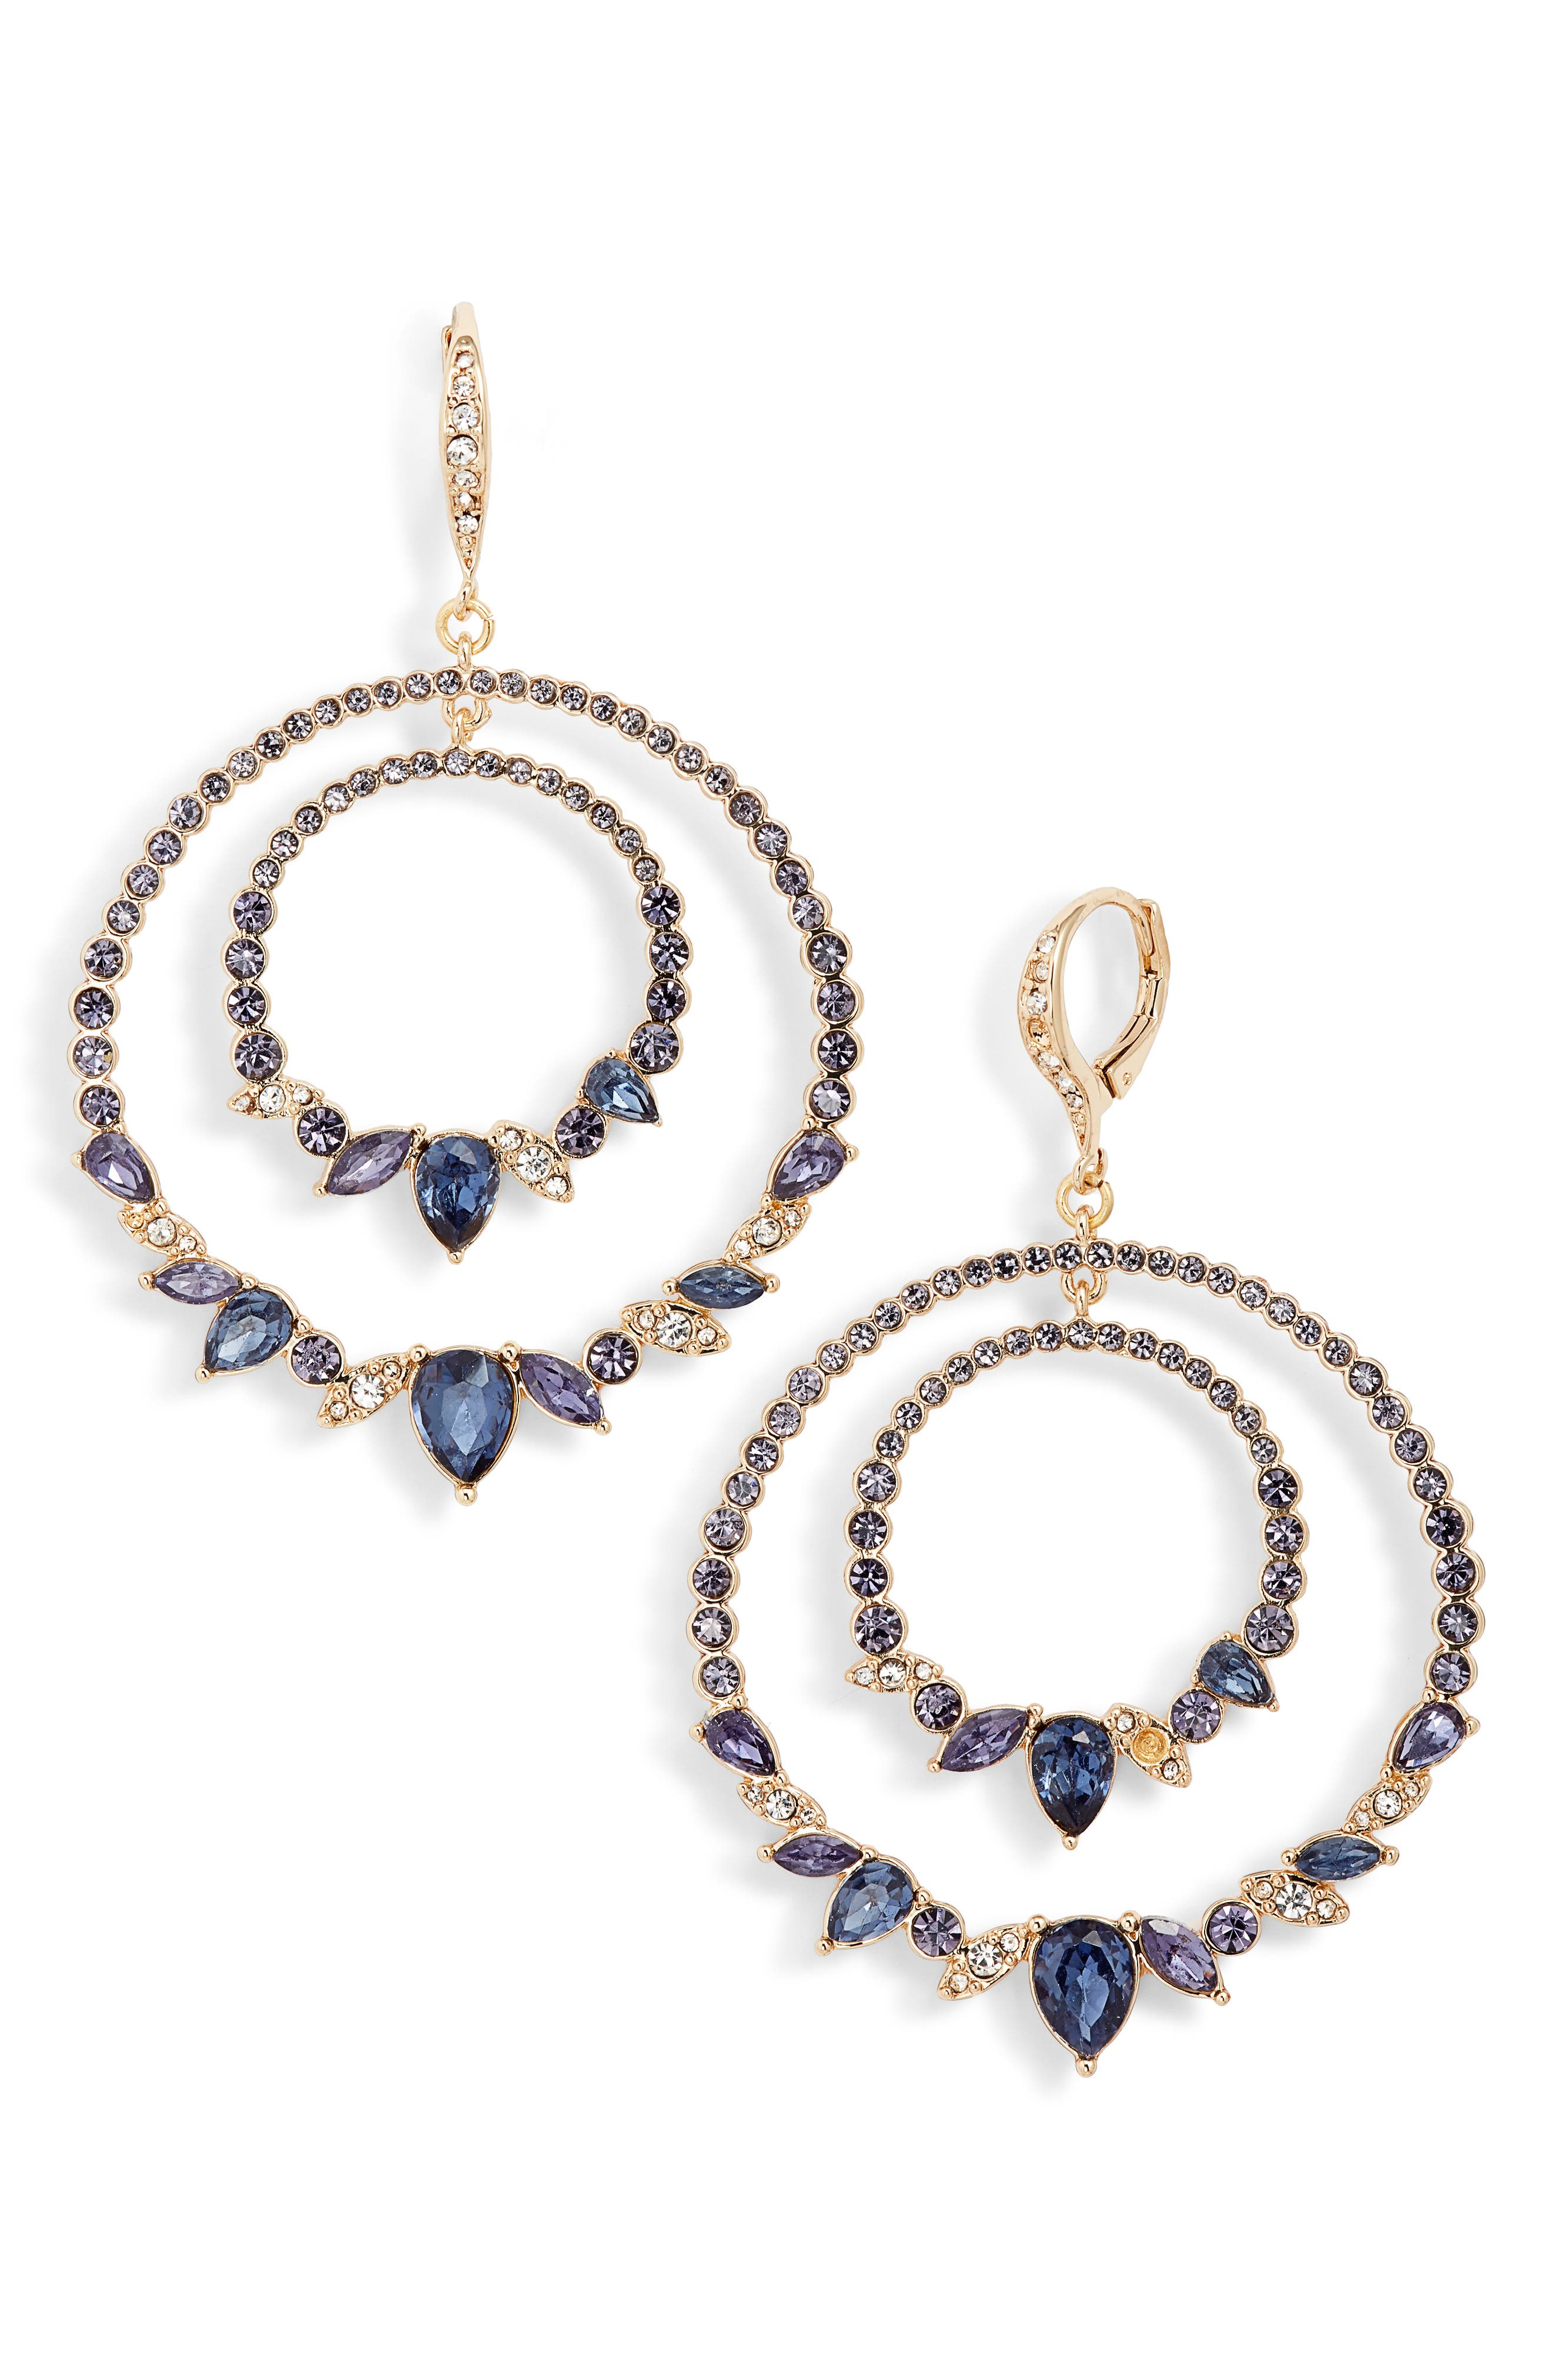 JENNY PACKHAM Orbital Crystal Drop Earrings, Main, color, PURPLE/ GOLD